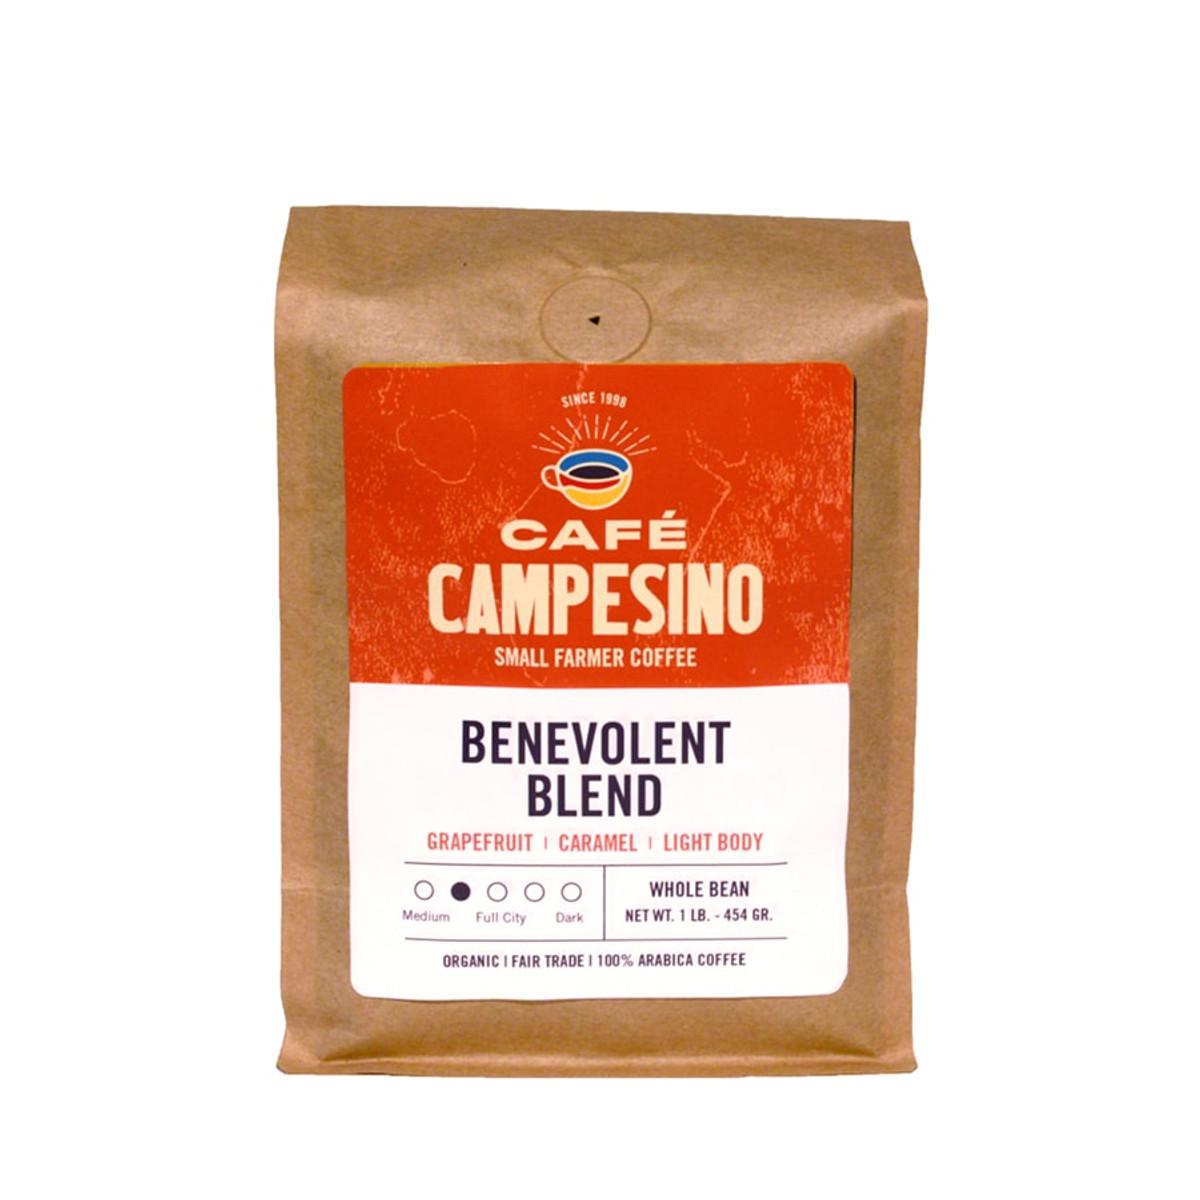 Benevolent Blend Medium Roast Coffee